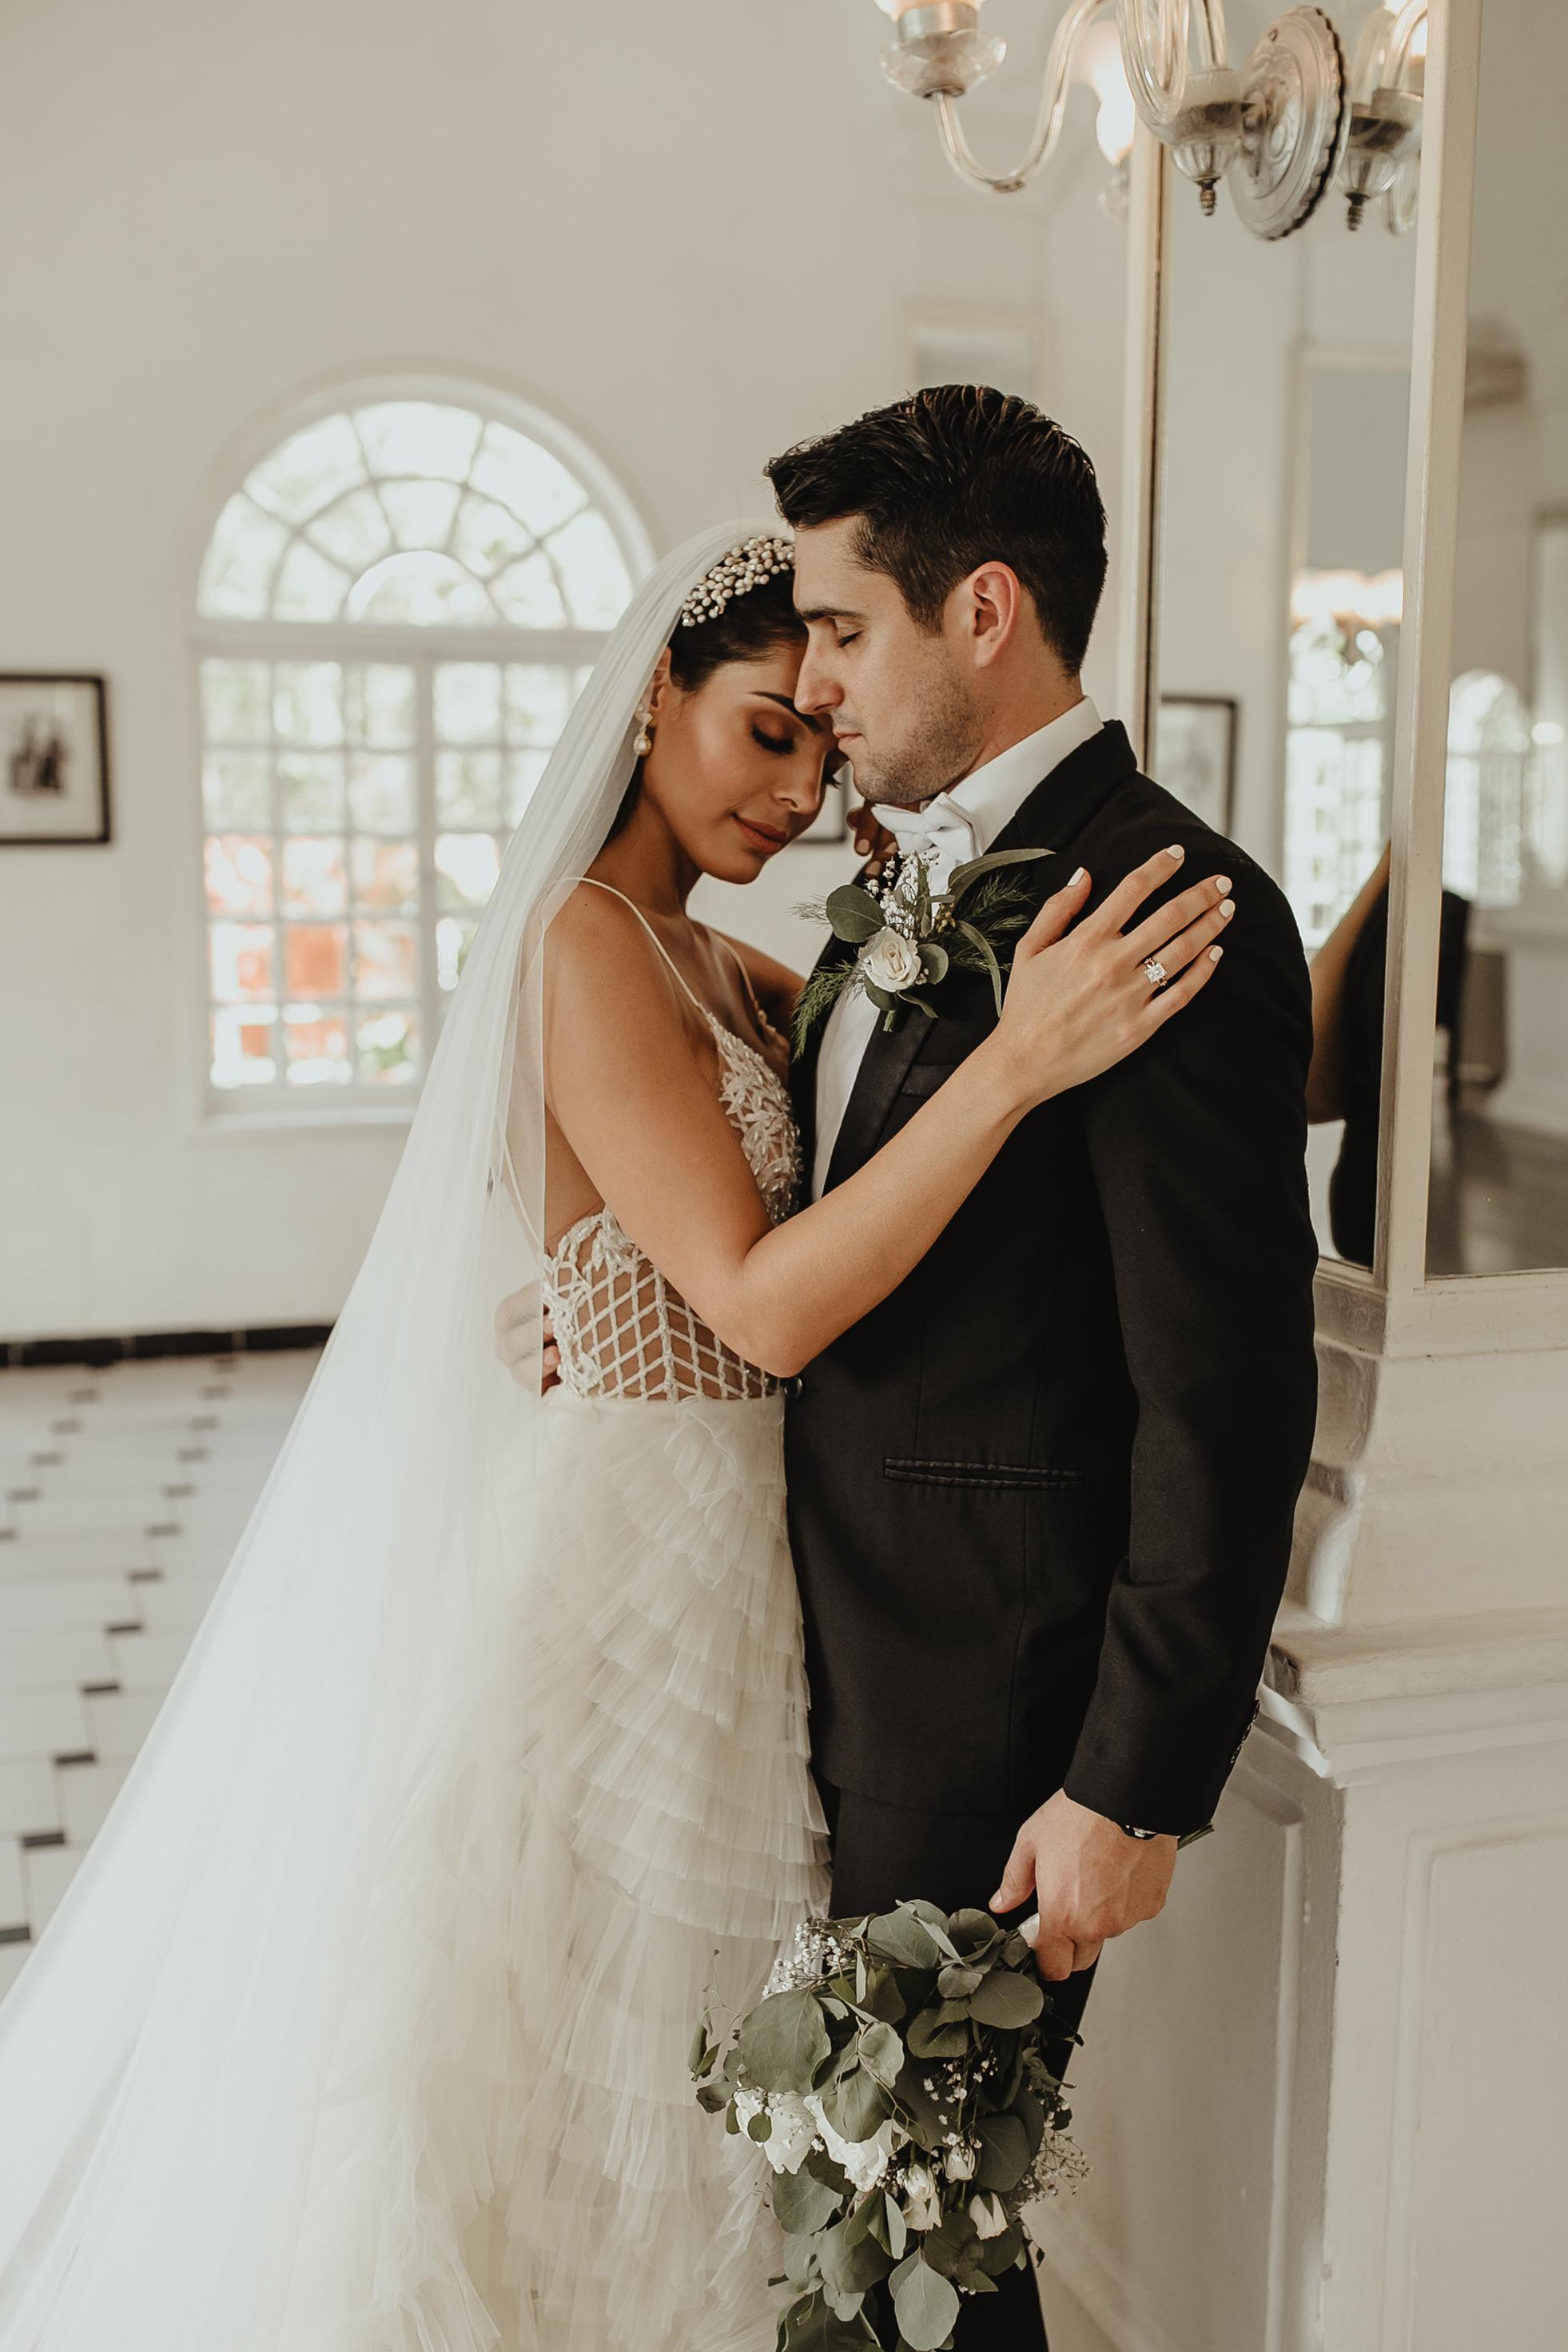 0397R&F__WeddingDestination_Weddingmerida_BodaMexico_FotografoDeBodas_FabrizioSimoneenFotografo.jpg